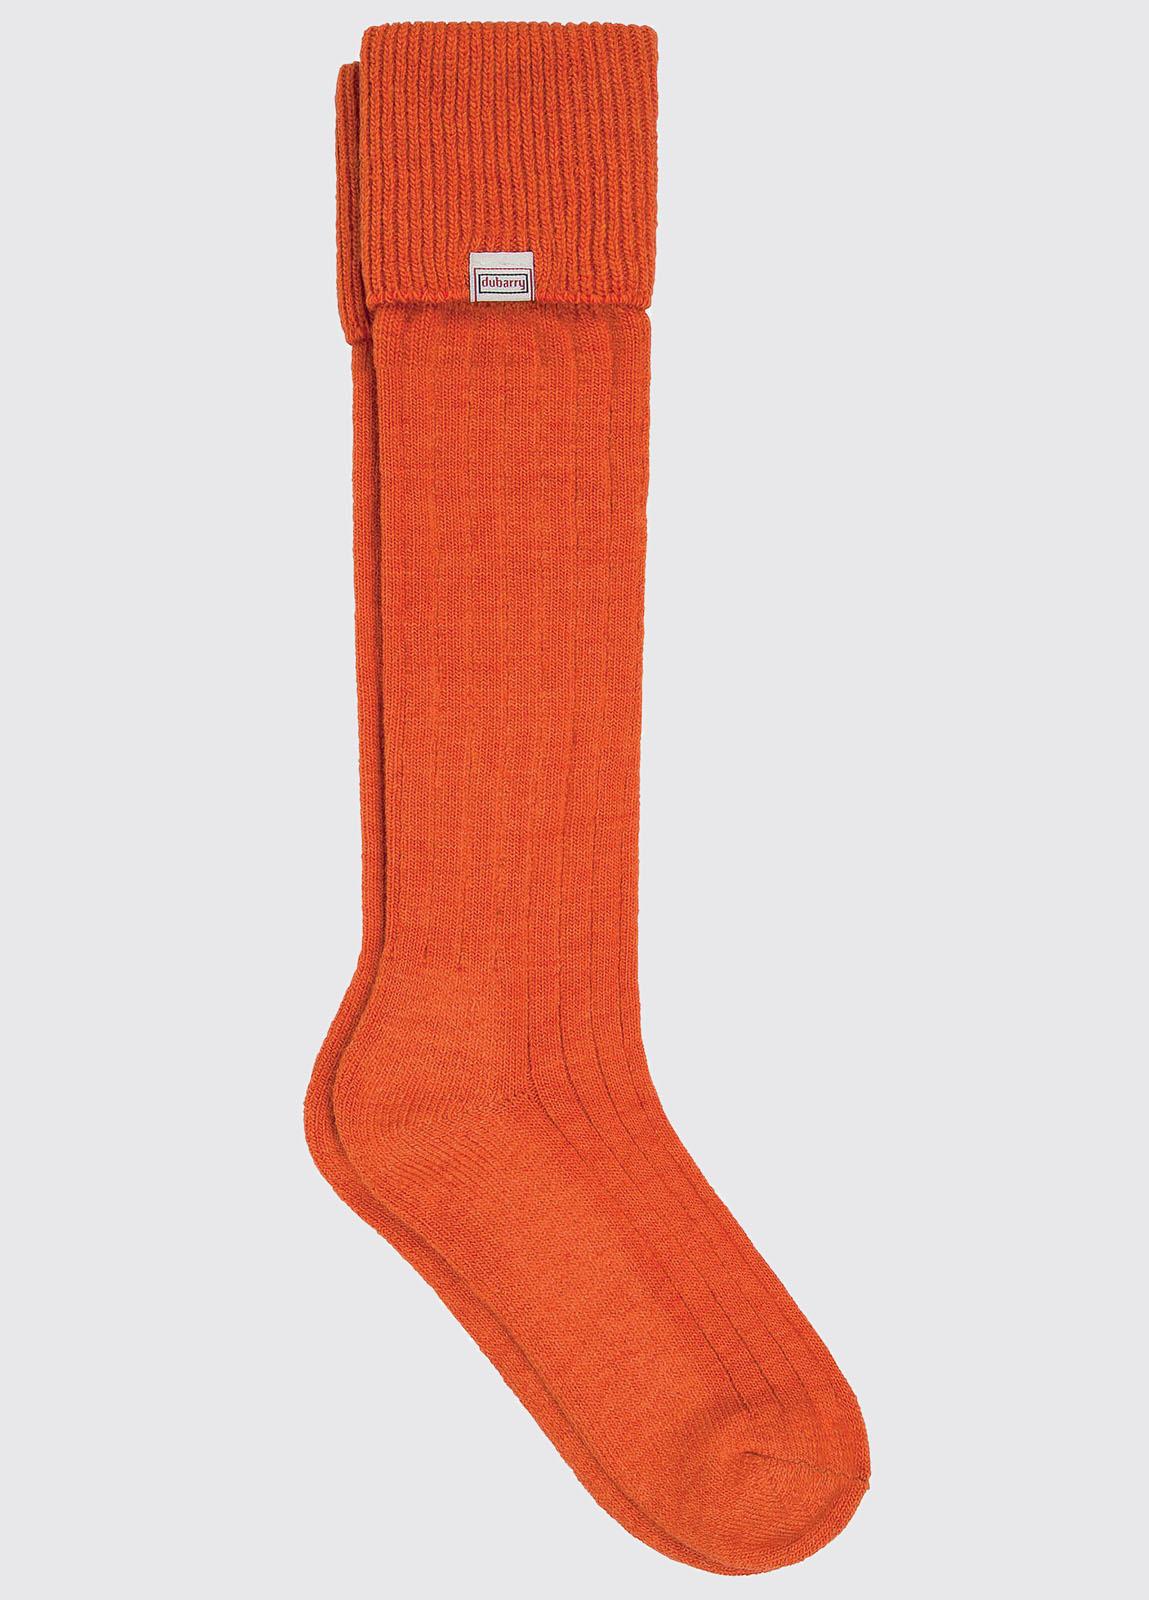 Alpaca Socks - Terracotta